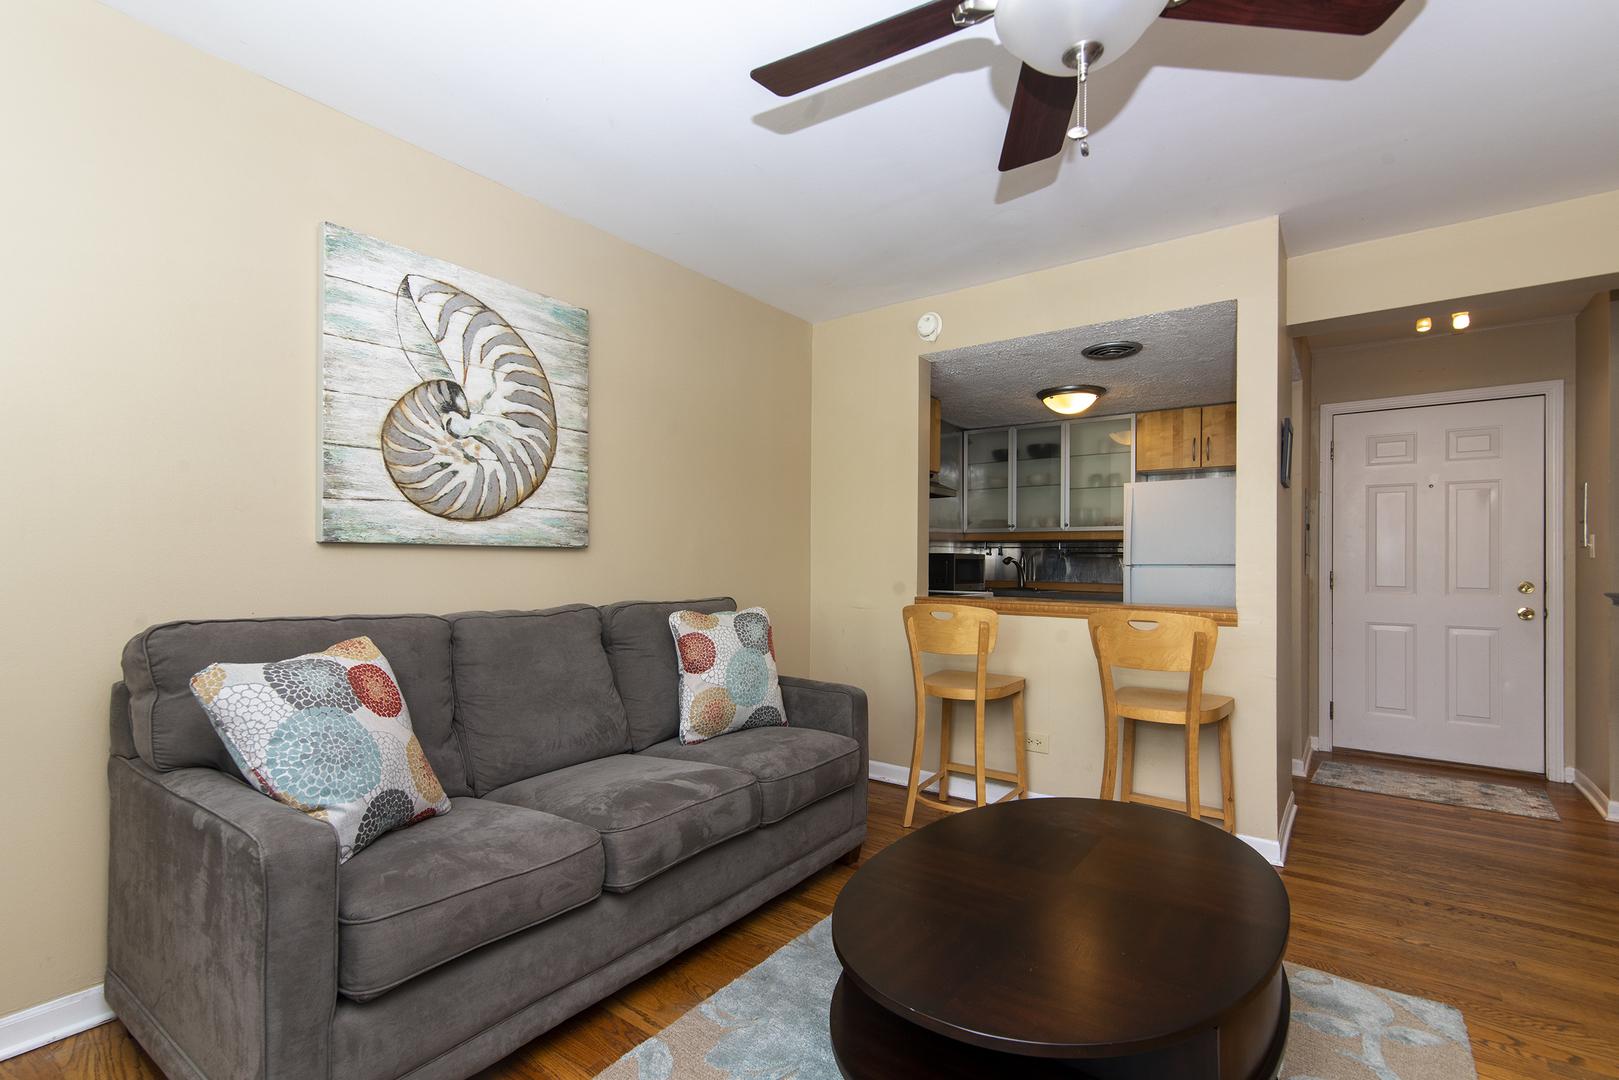 1050 W Columbia Ave apartments for rent at AptAmigo